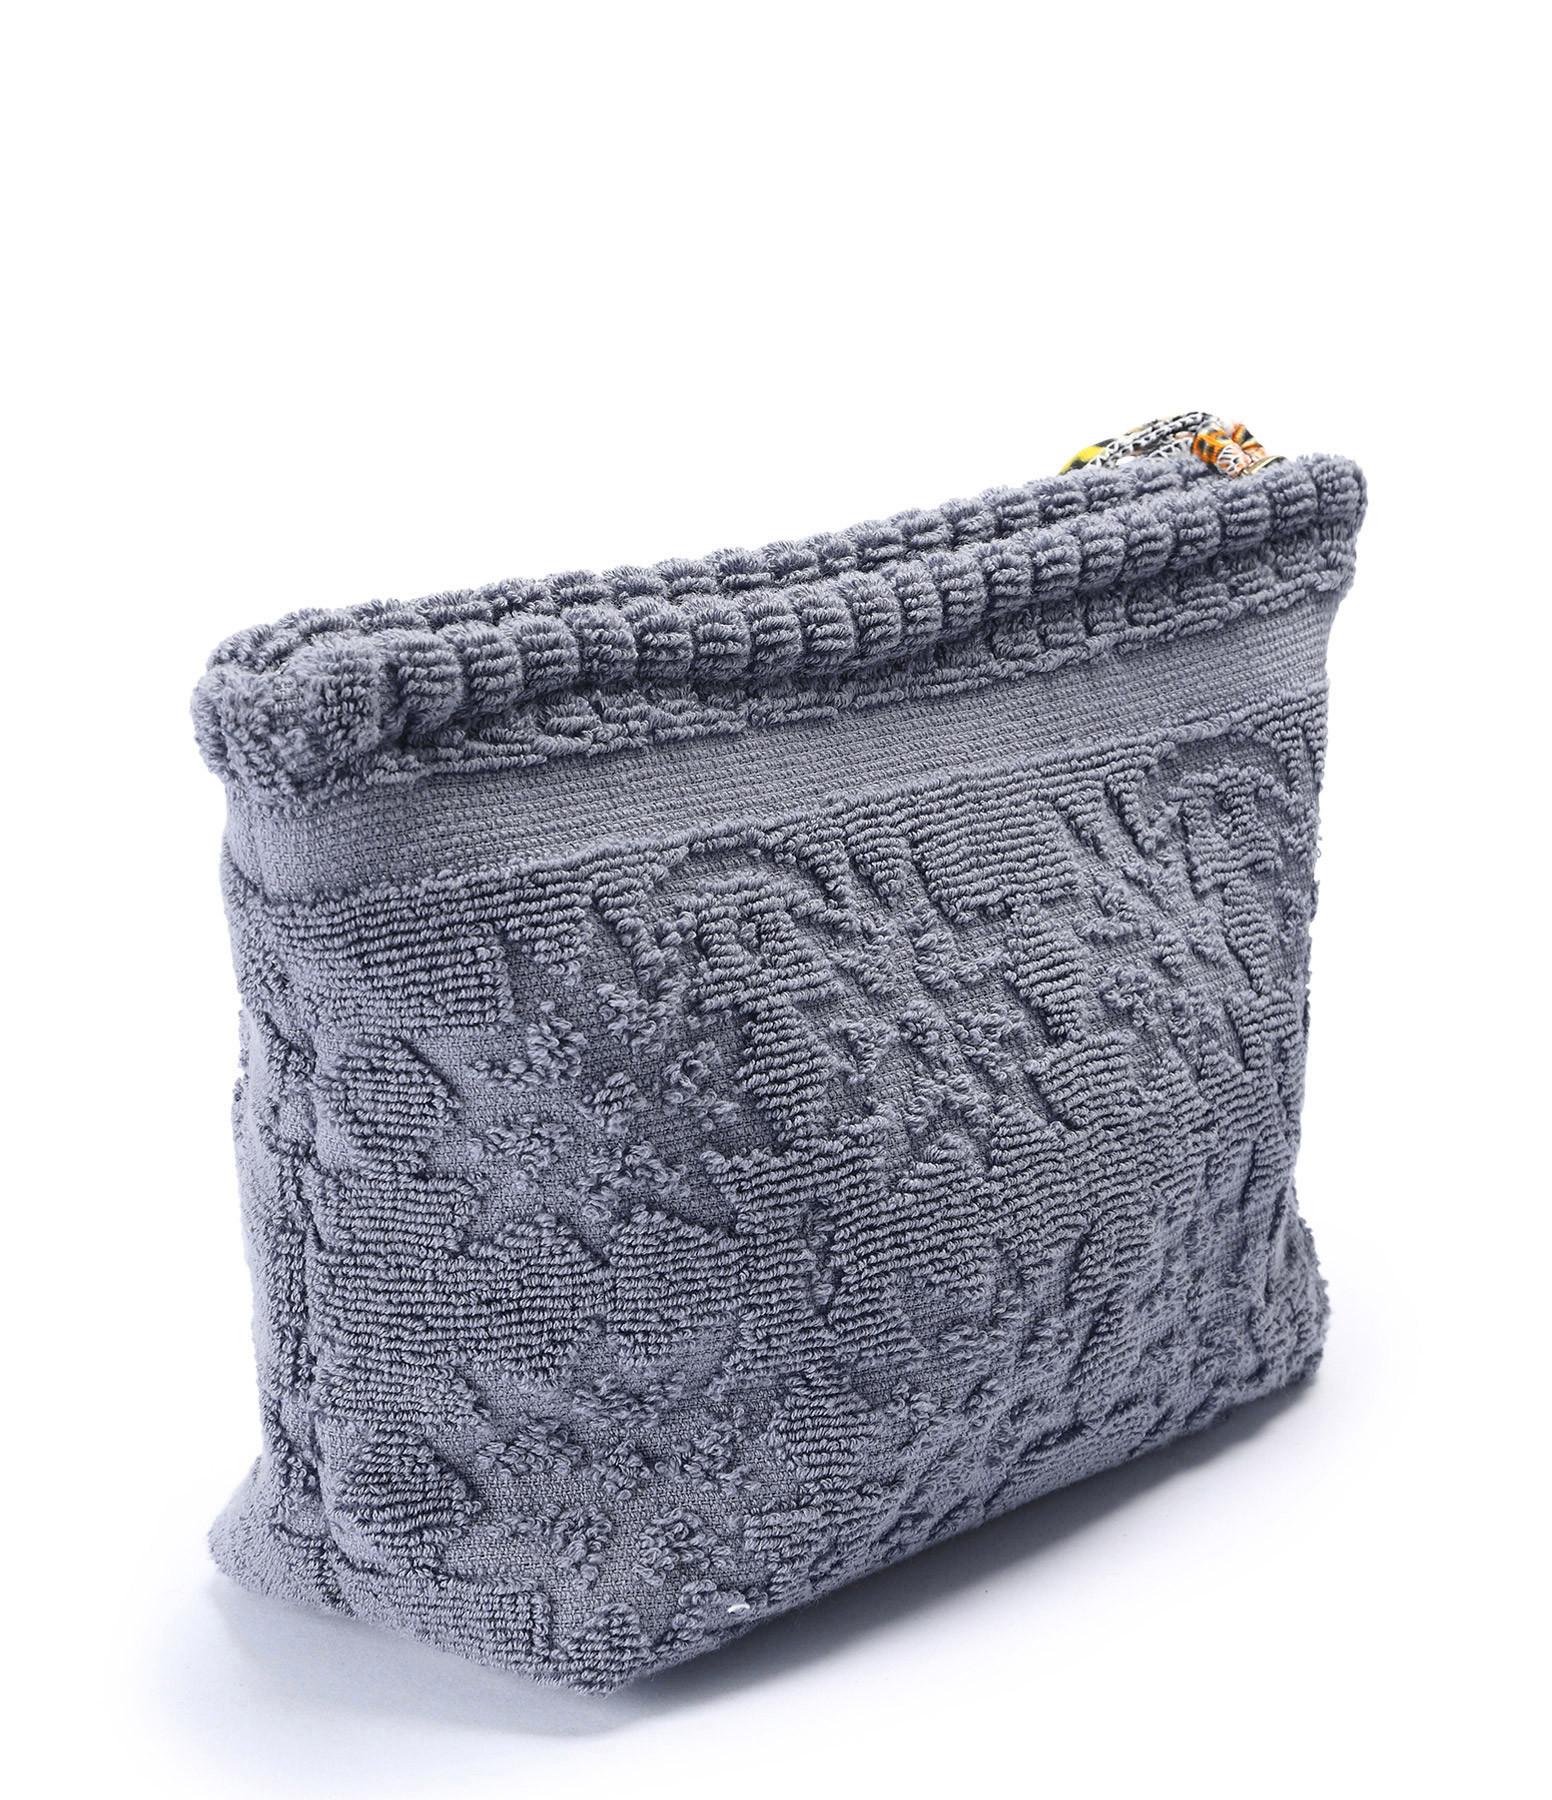 LALLA - Petite Trousse Walakin Eponge Anthracite